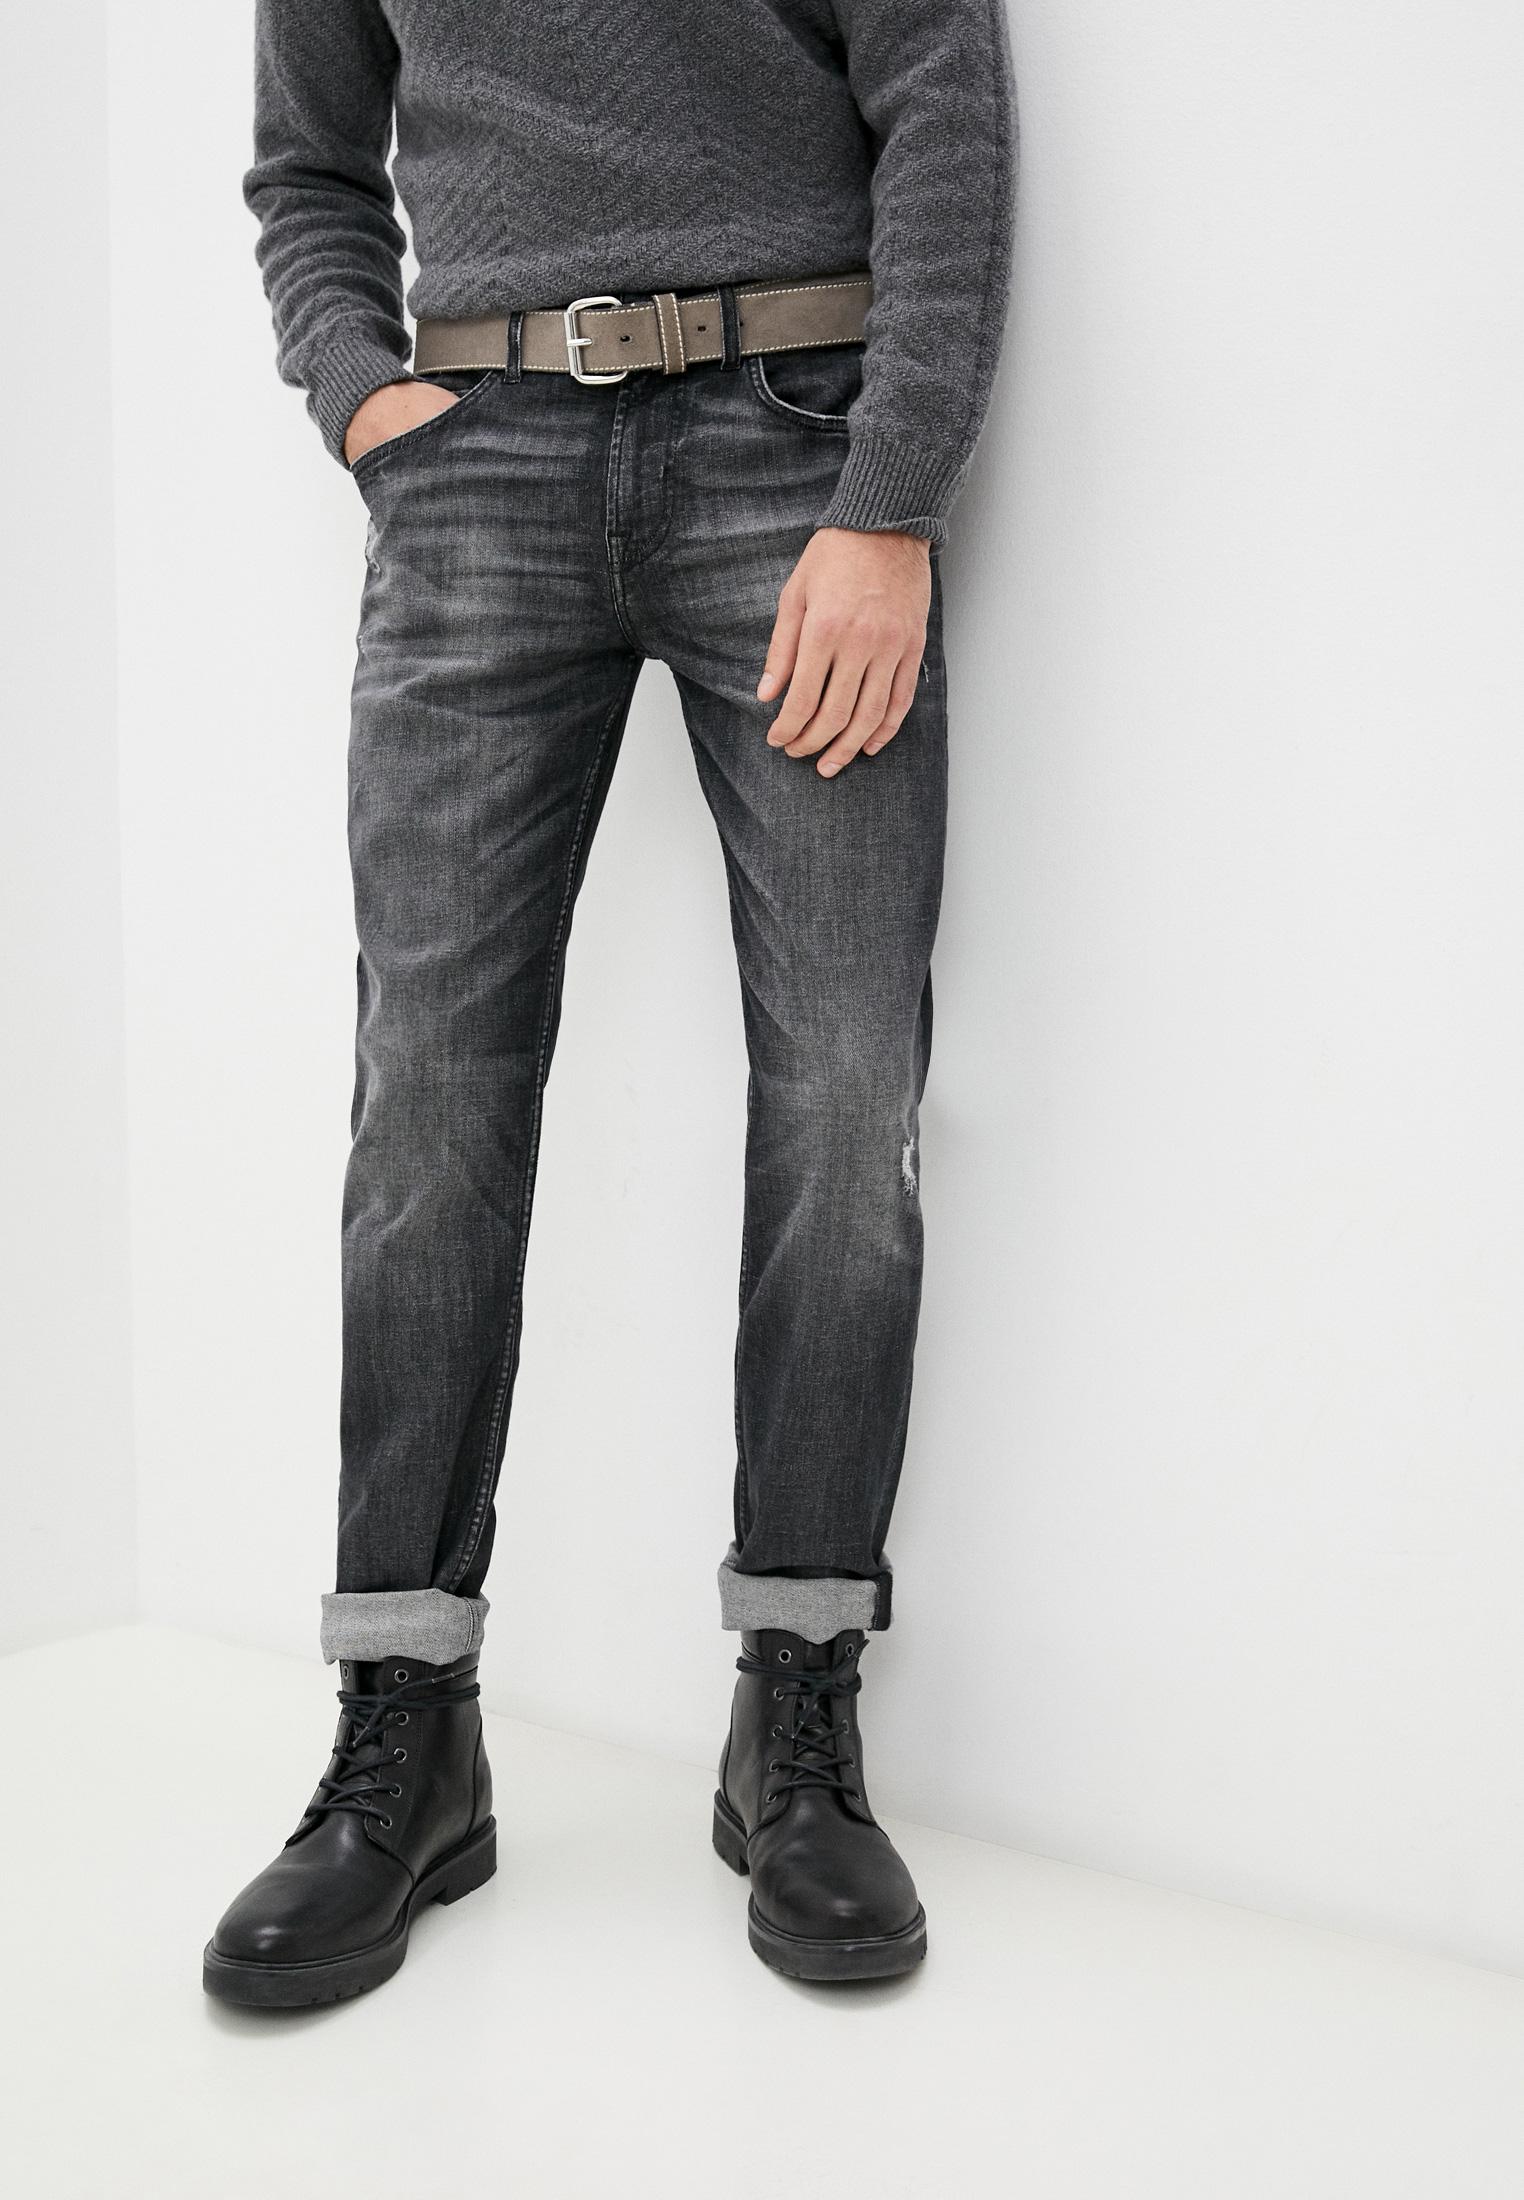 Зауженные джинсы 7 For All Mankind (7 Фо Олл Мэнкайнд) JSMXU790TH: изображение 1